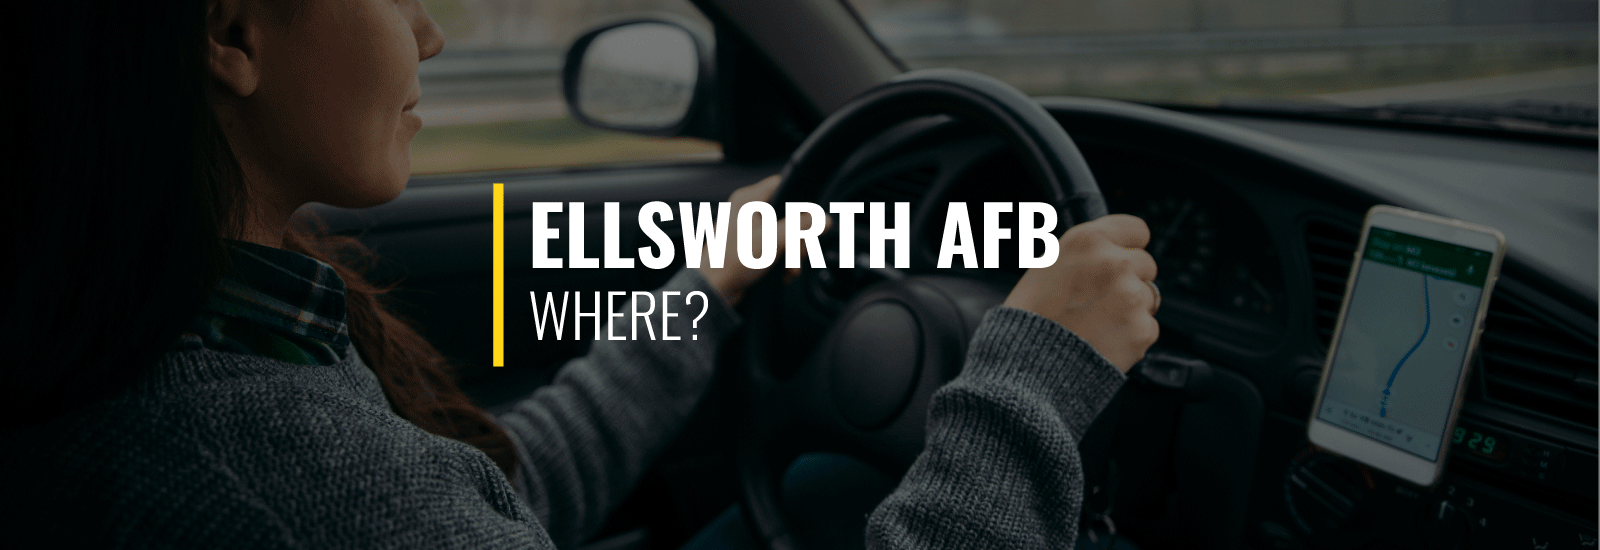 Where is Ellsworth Air Force Base?